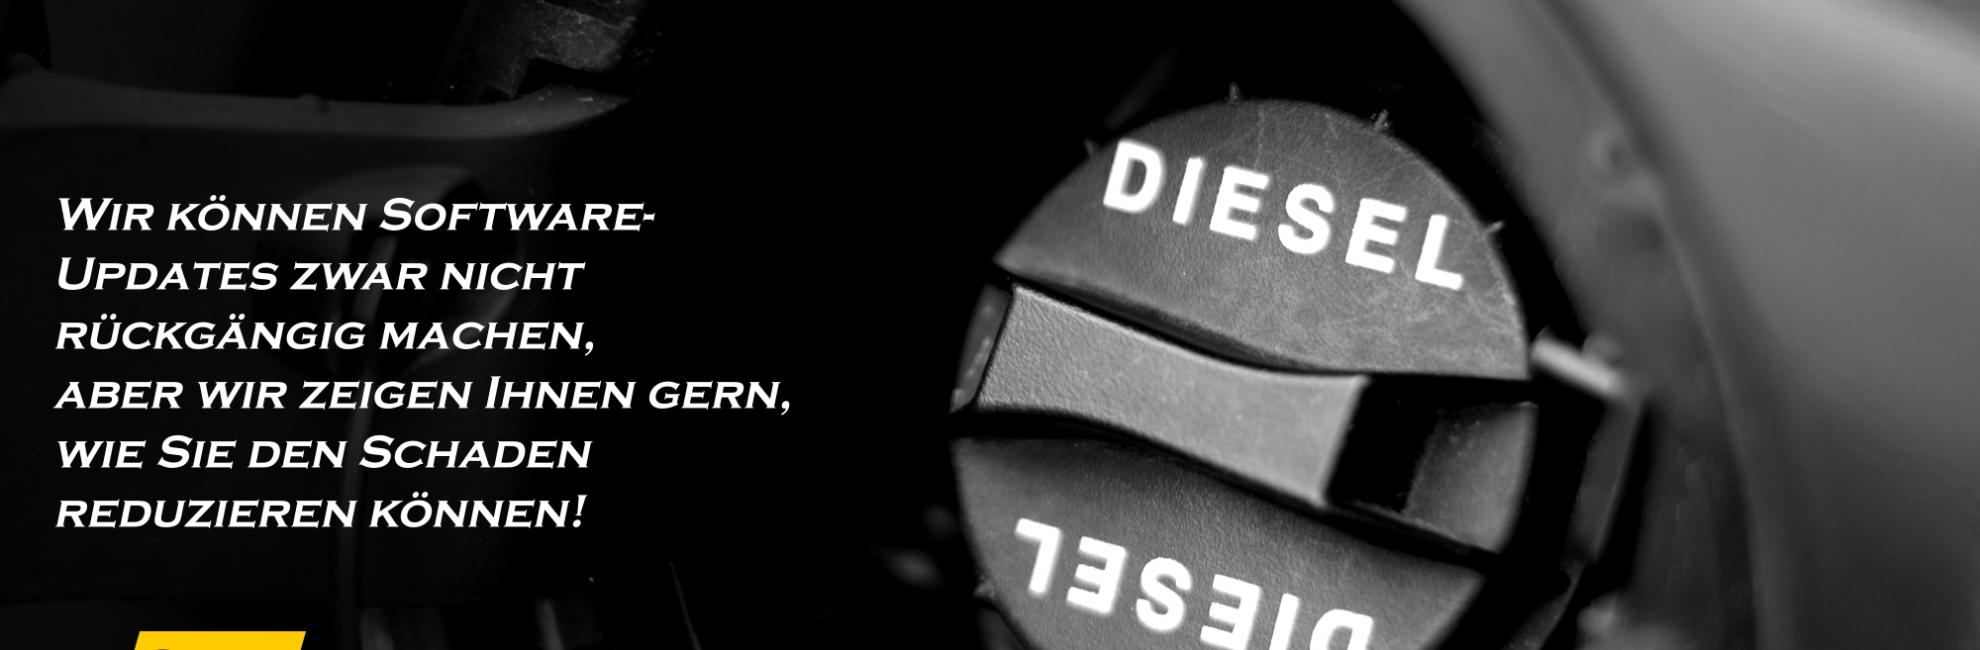 Diesel Software SKN